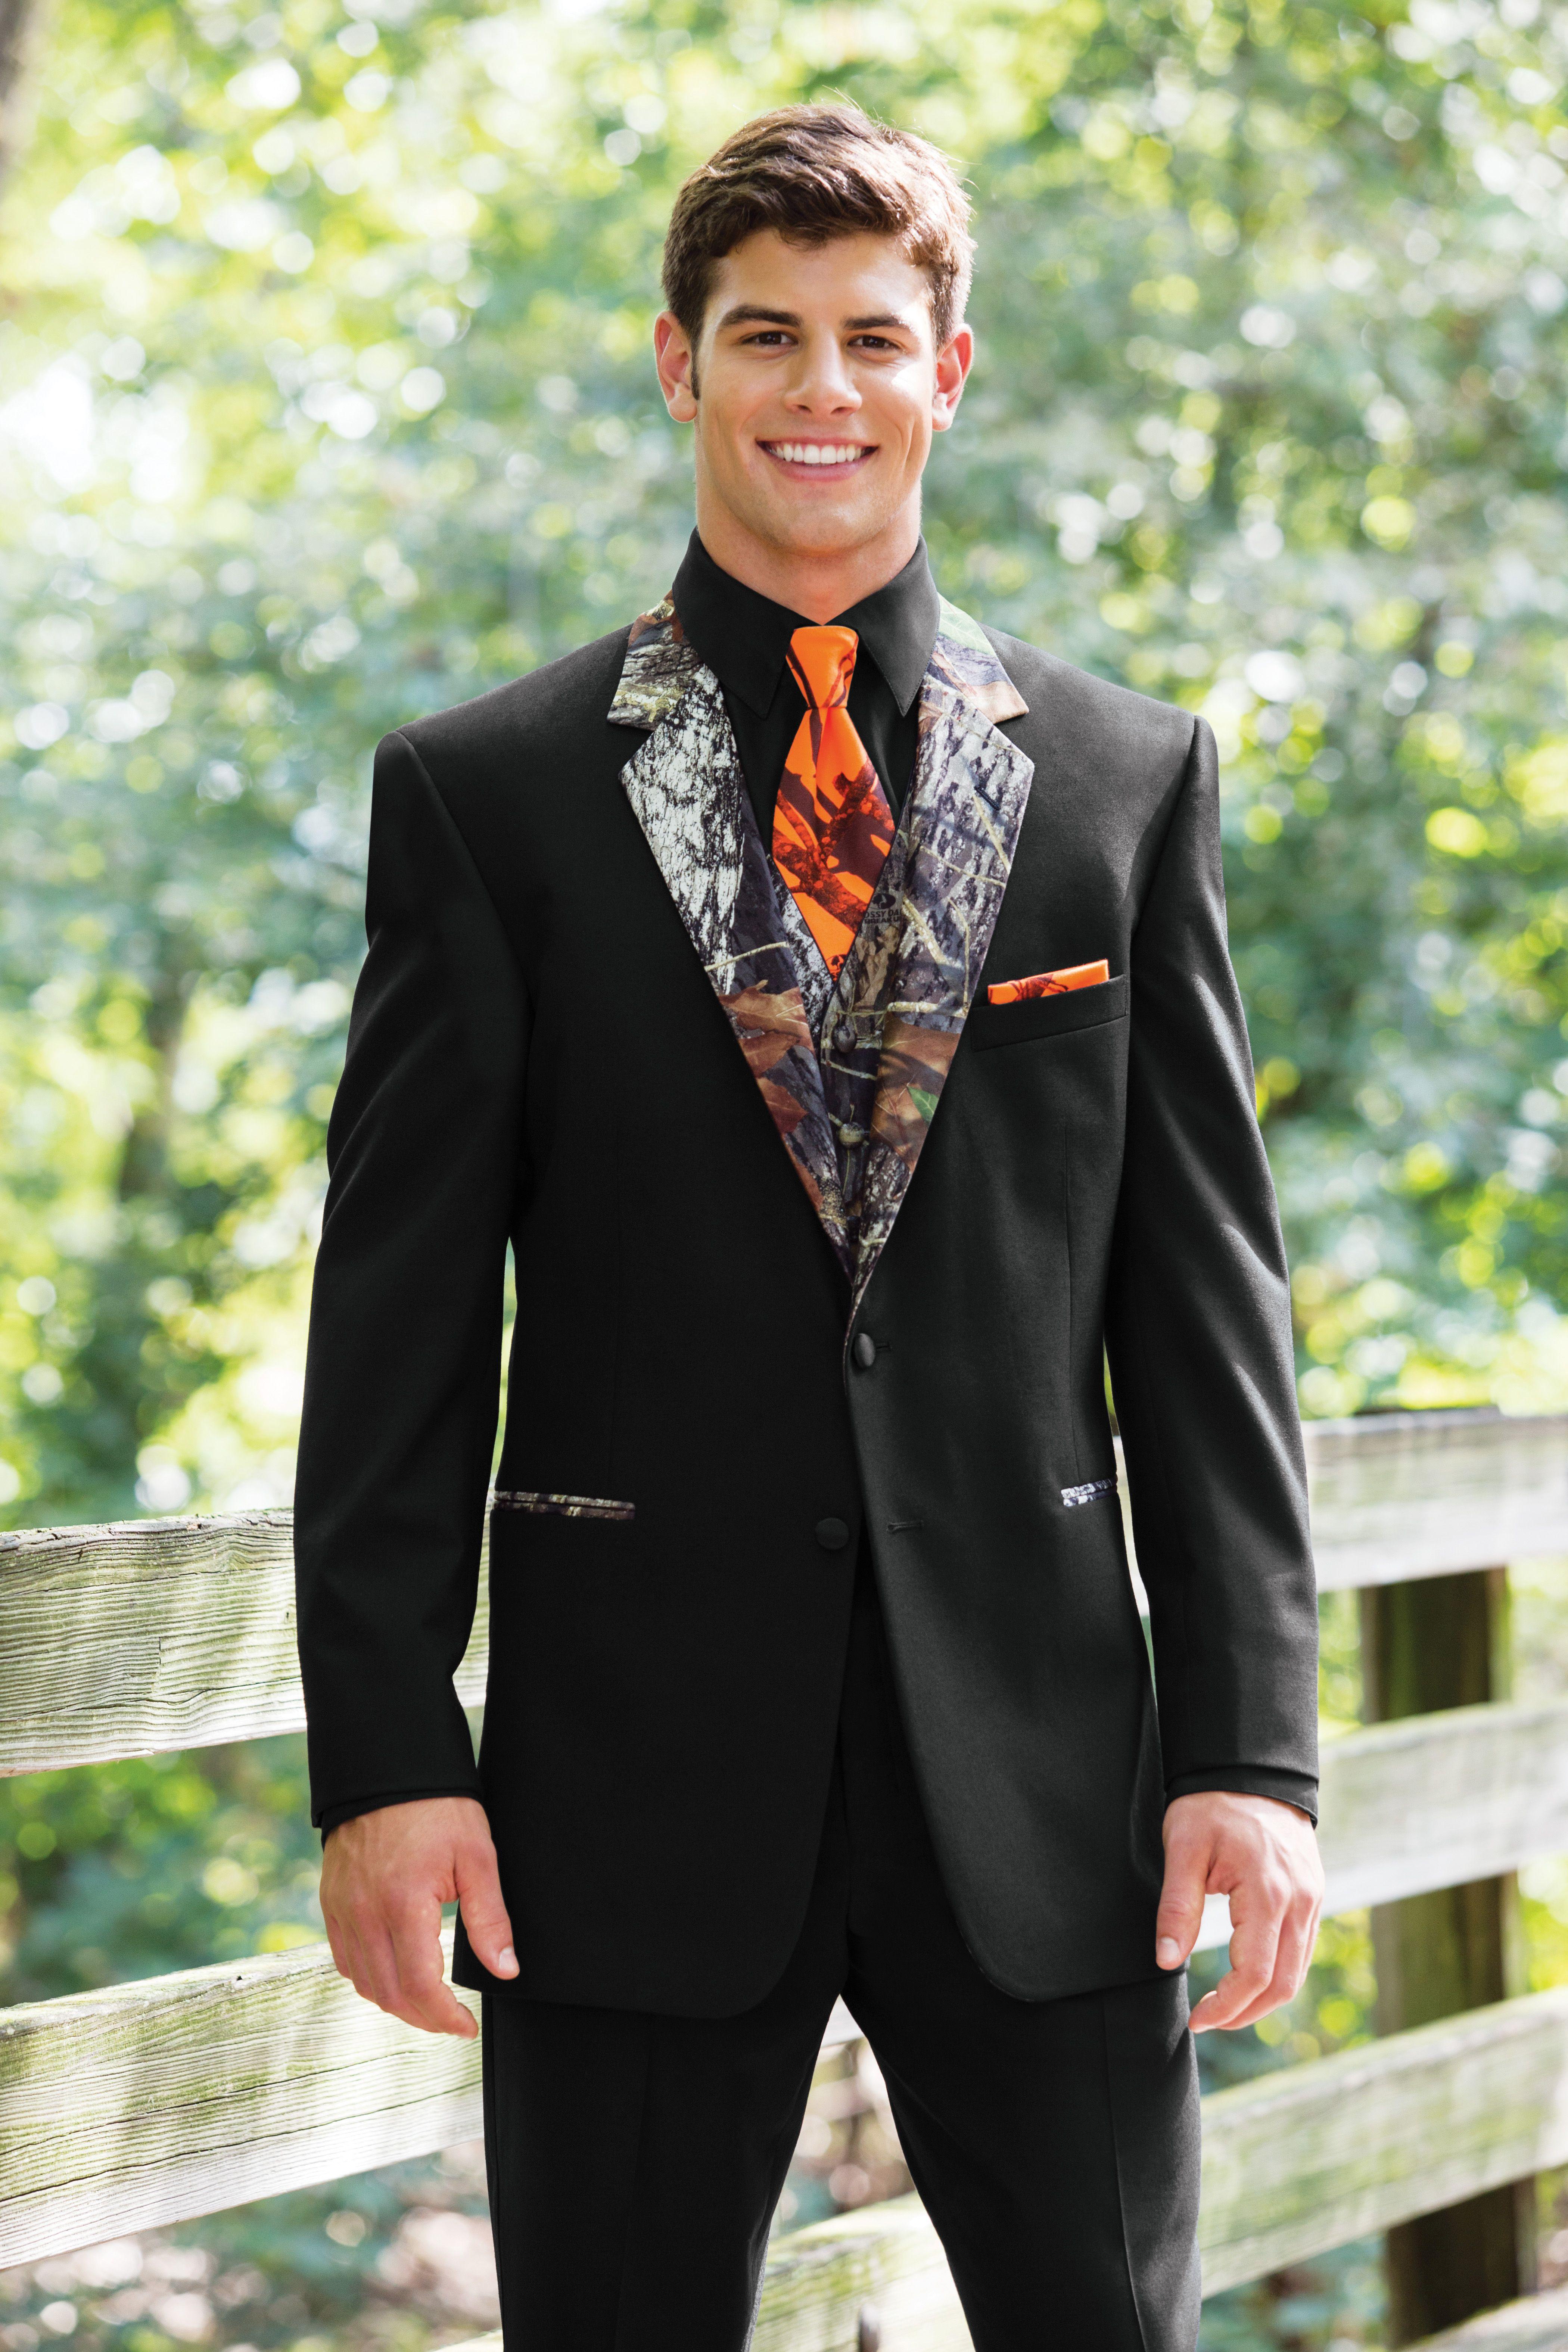 7496fe5c4403 Camo Wedding, Tuxedo Wedding, Wedding Tuxedos, Camouflage Wedding, Camo  Tuxedo, Custom